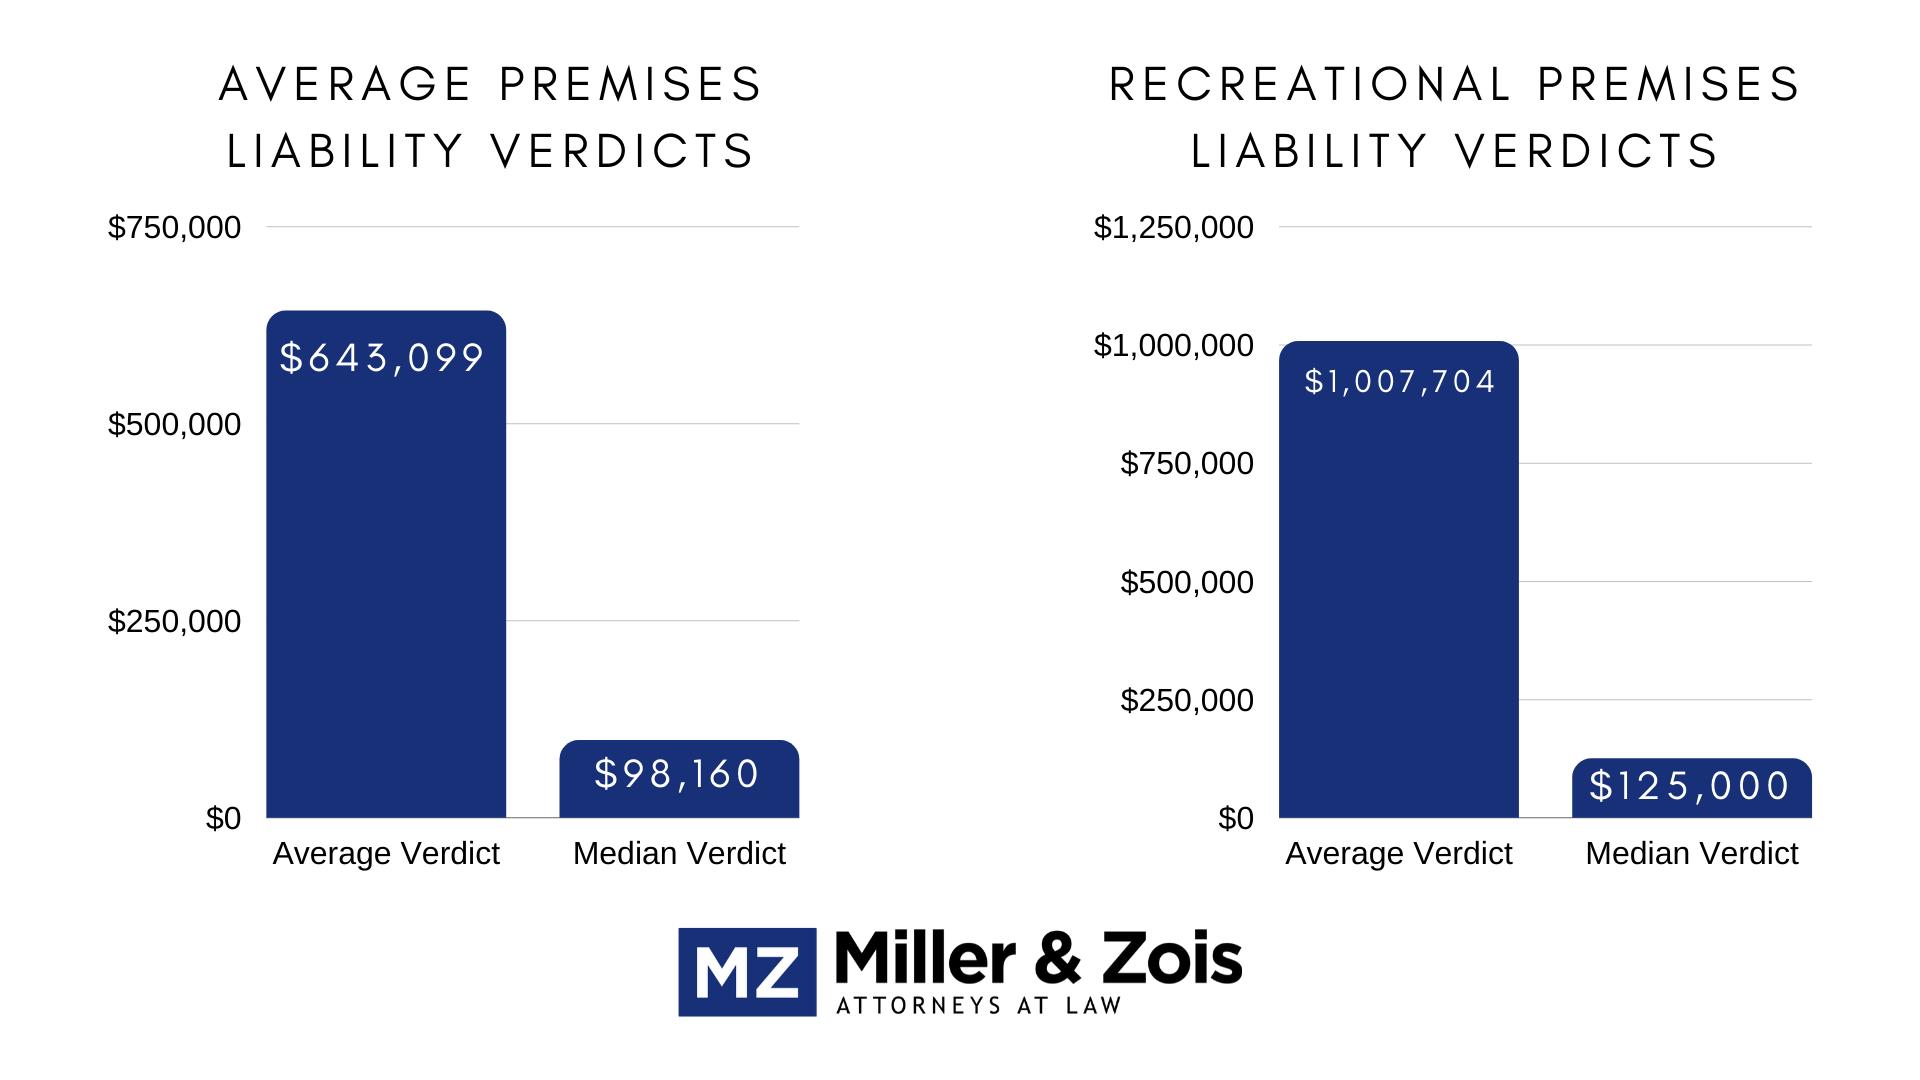 average premise liability verdicts